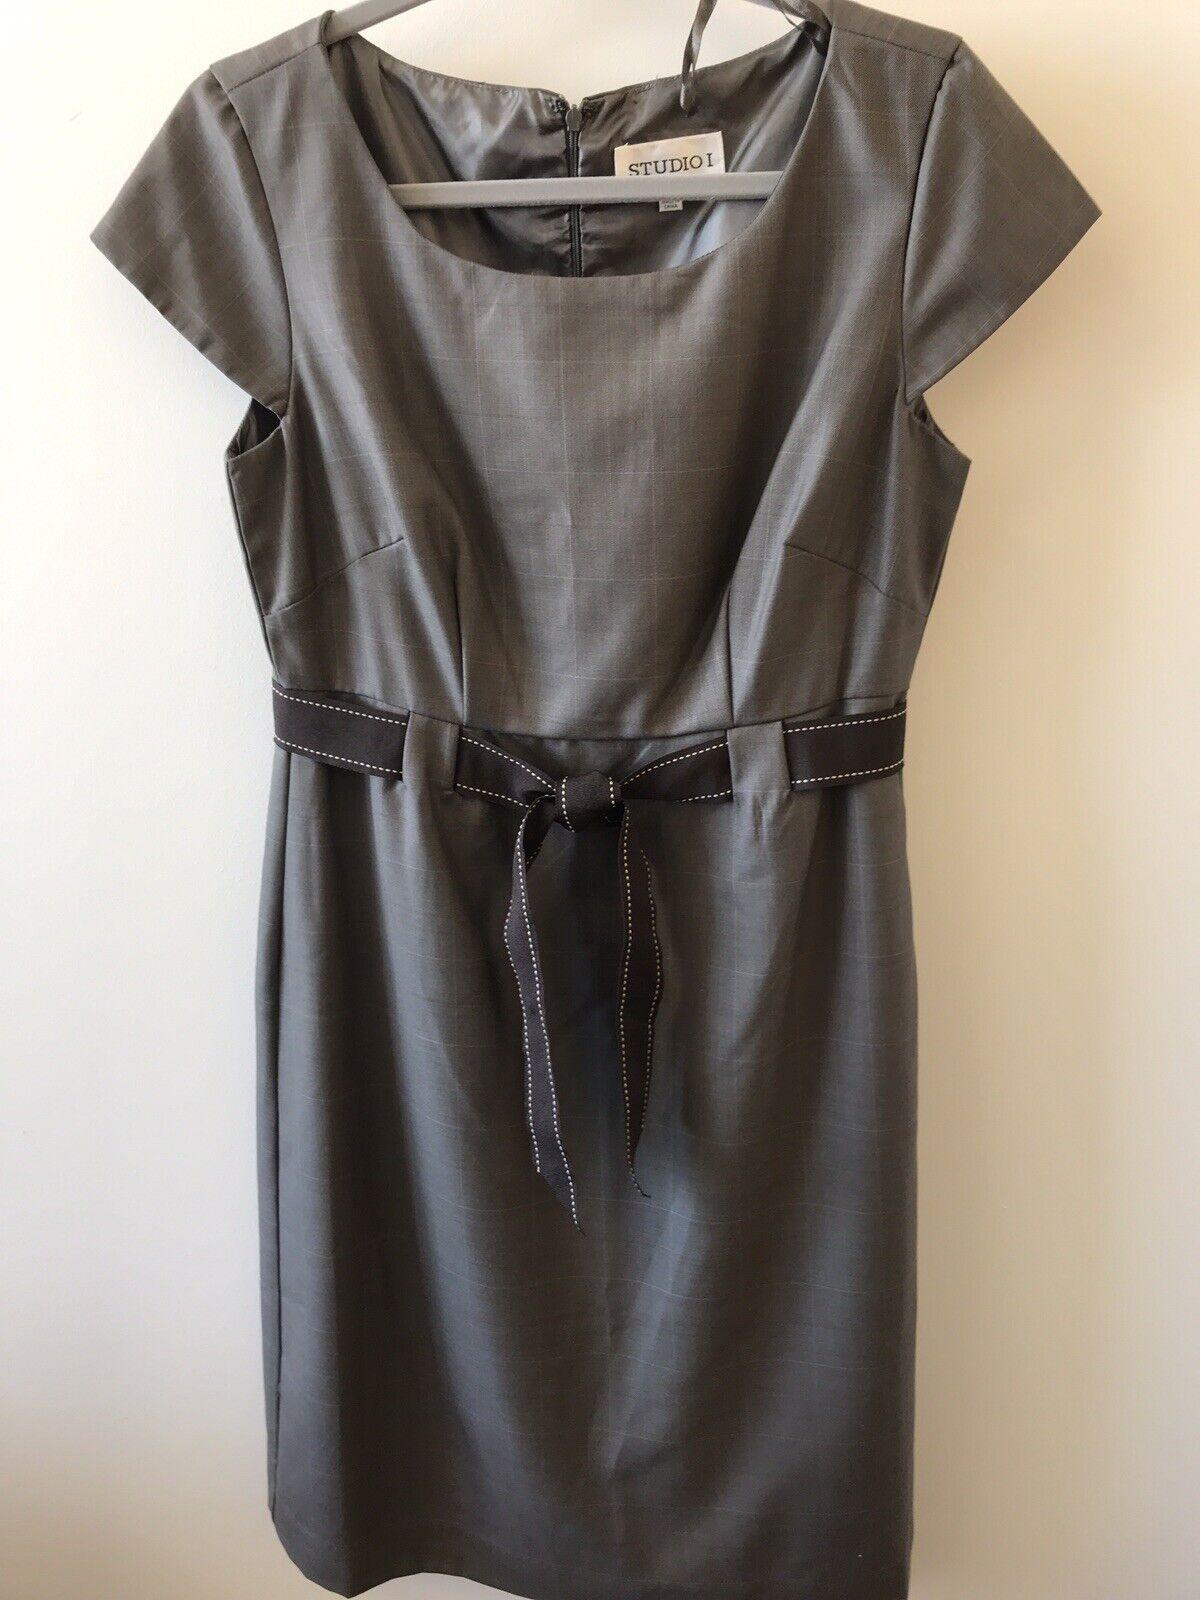 Studio 1 One New York - Women's Cap Sleeve Dress Size 8